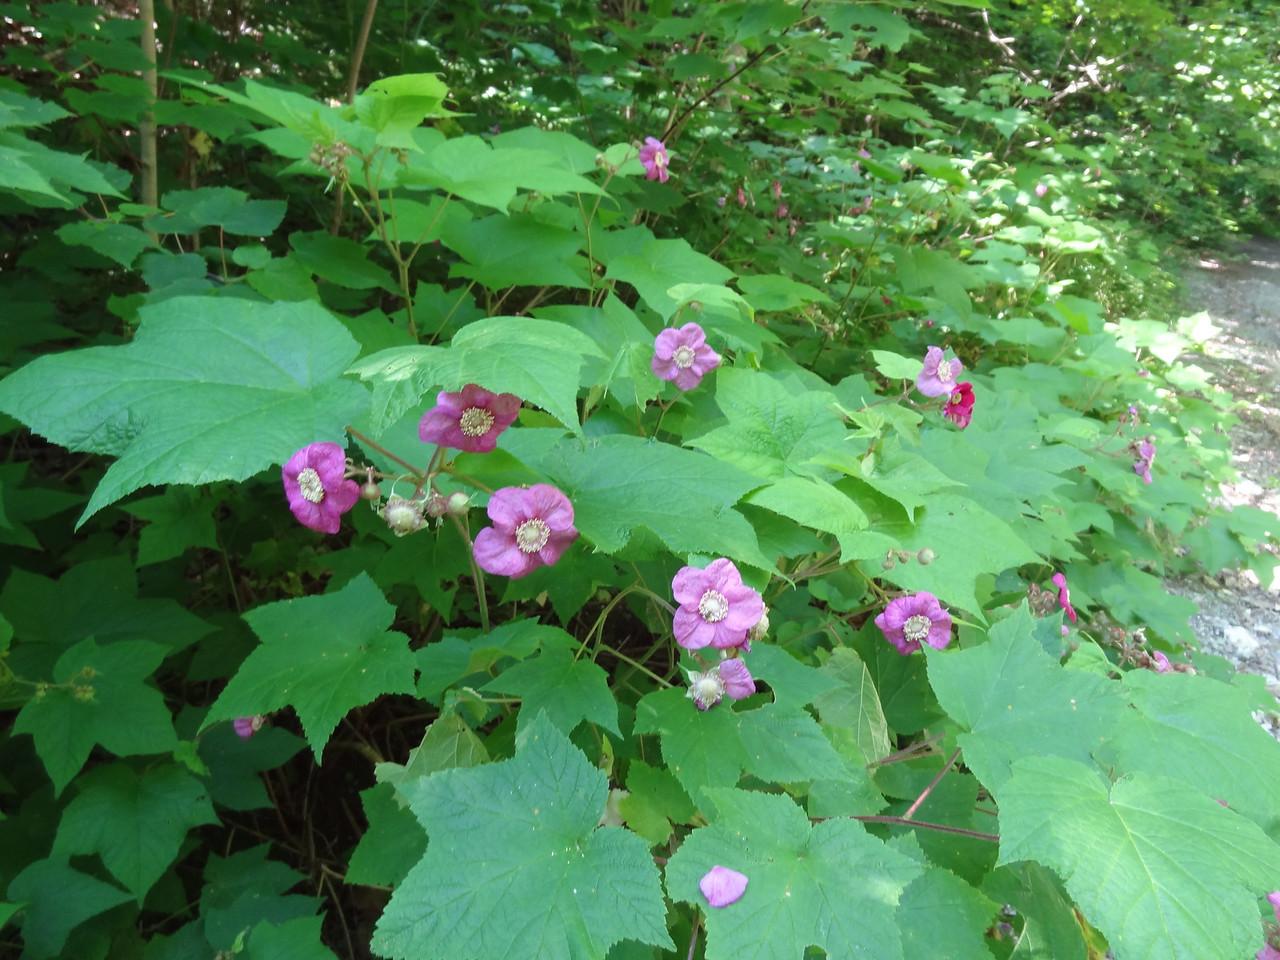 Purple Flowering Raspberry or Rubus odoratus as I like to call it.